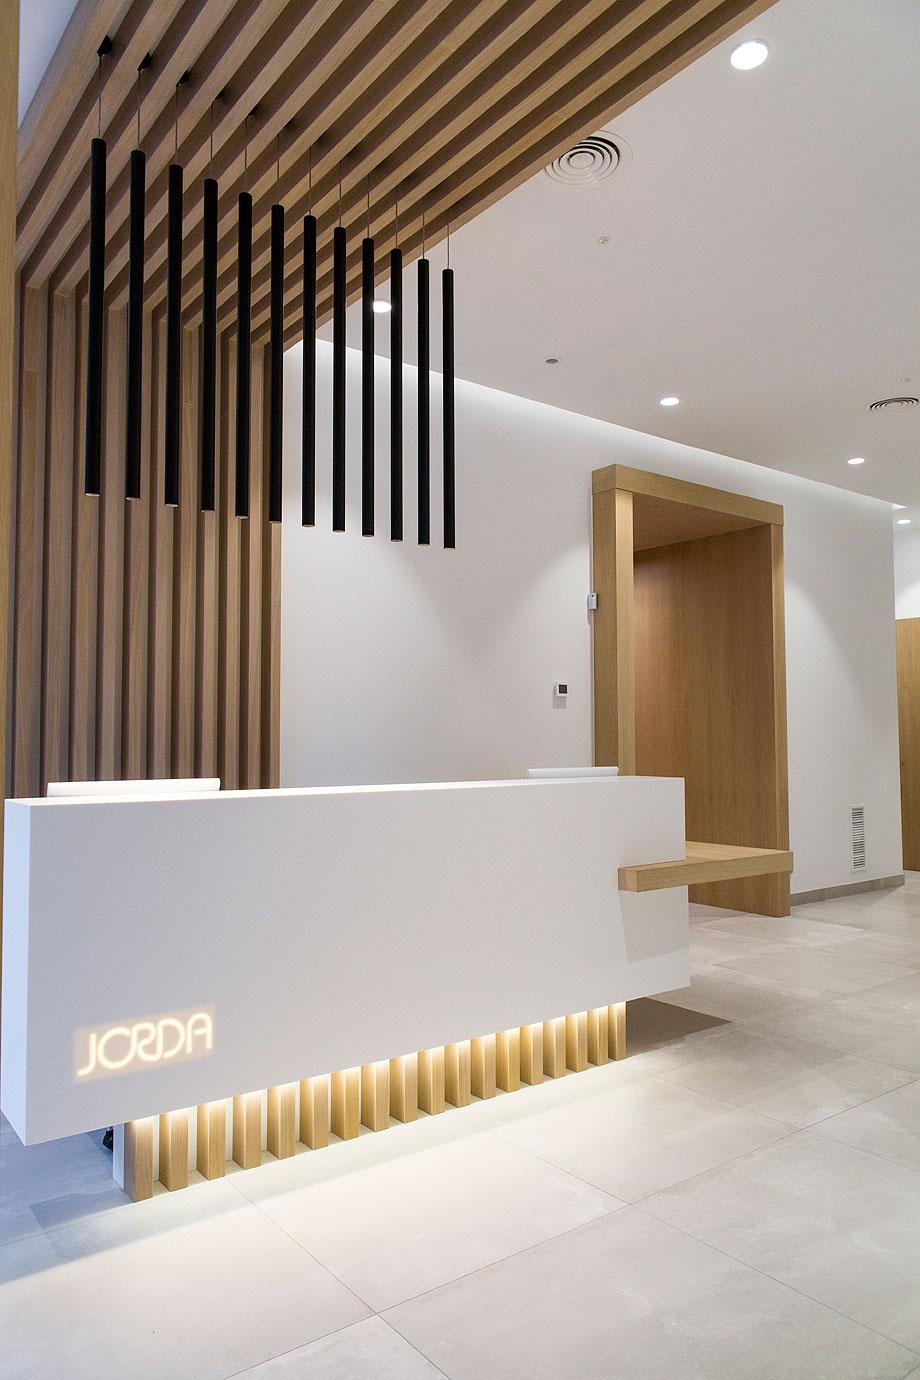 clinica-dental-jorda-ebano-arquitectura-interior (3)